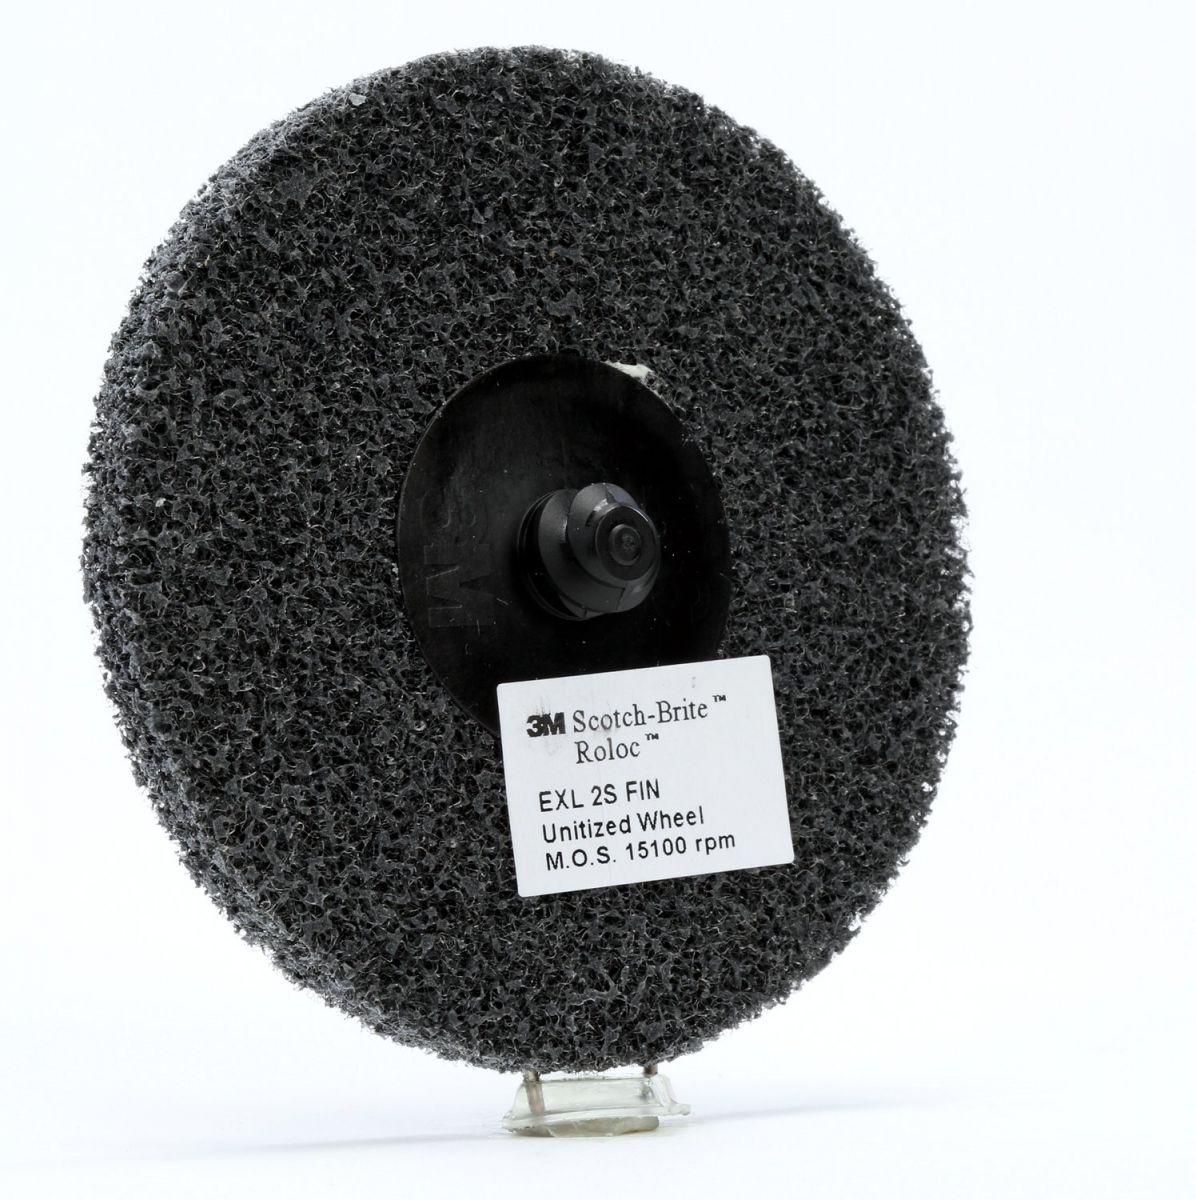 3m scotchbrite roloc exl unitised wiel xldr 76 mm x 6 mm 2s fin pn17184